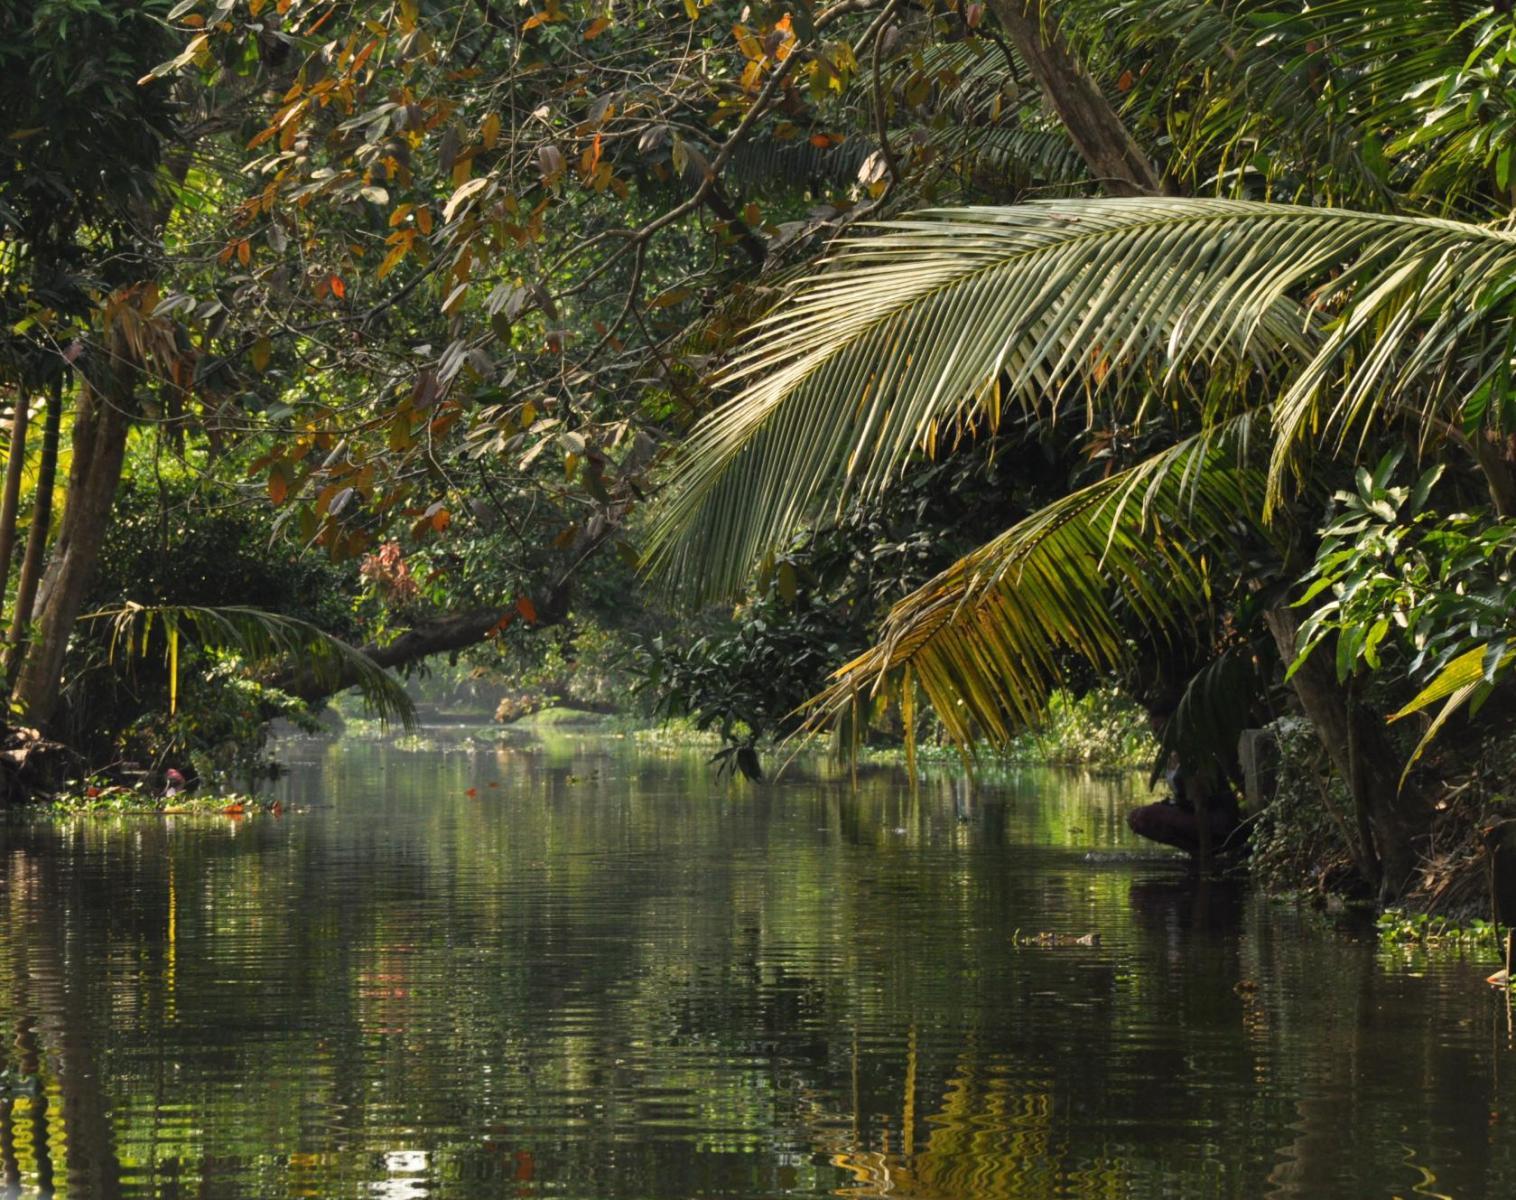 Inde  Grande Traversée de l'Inde du Sud   Découverte Observation nature